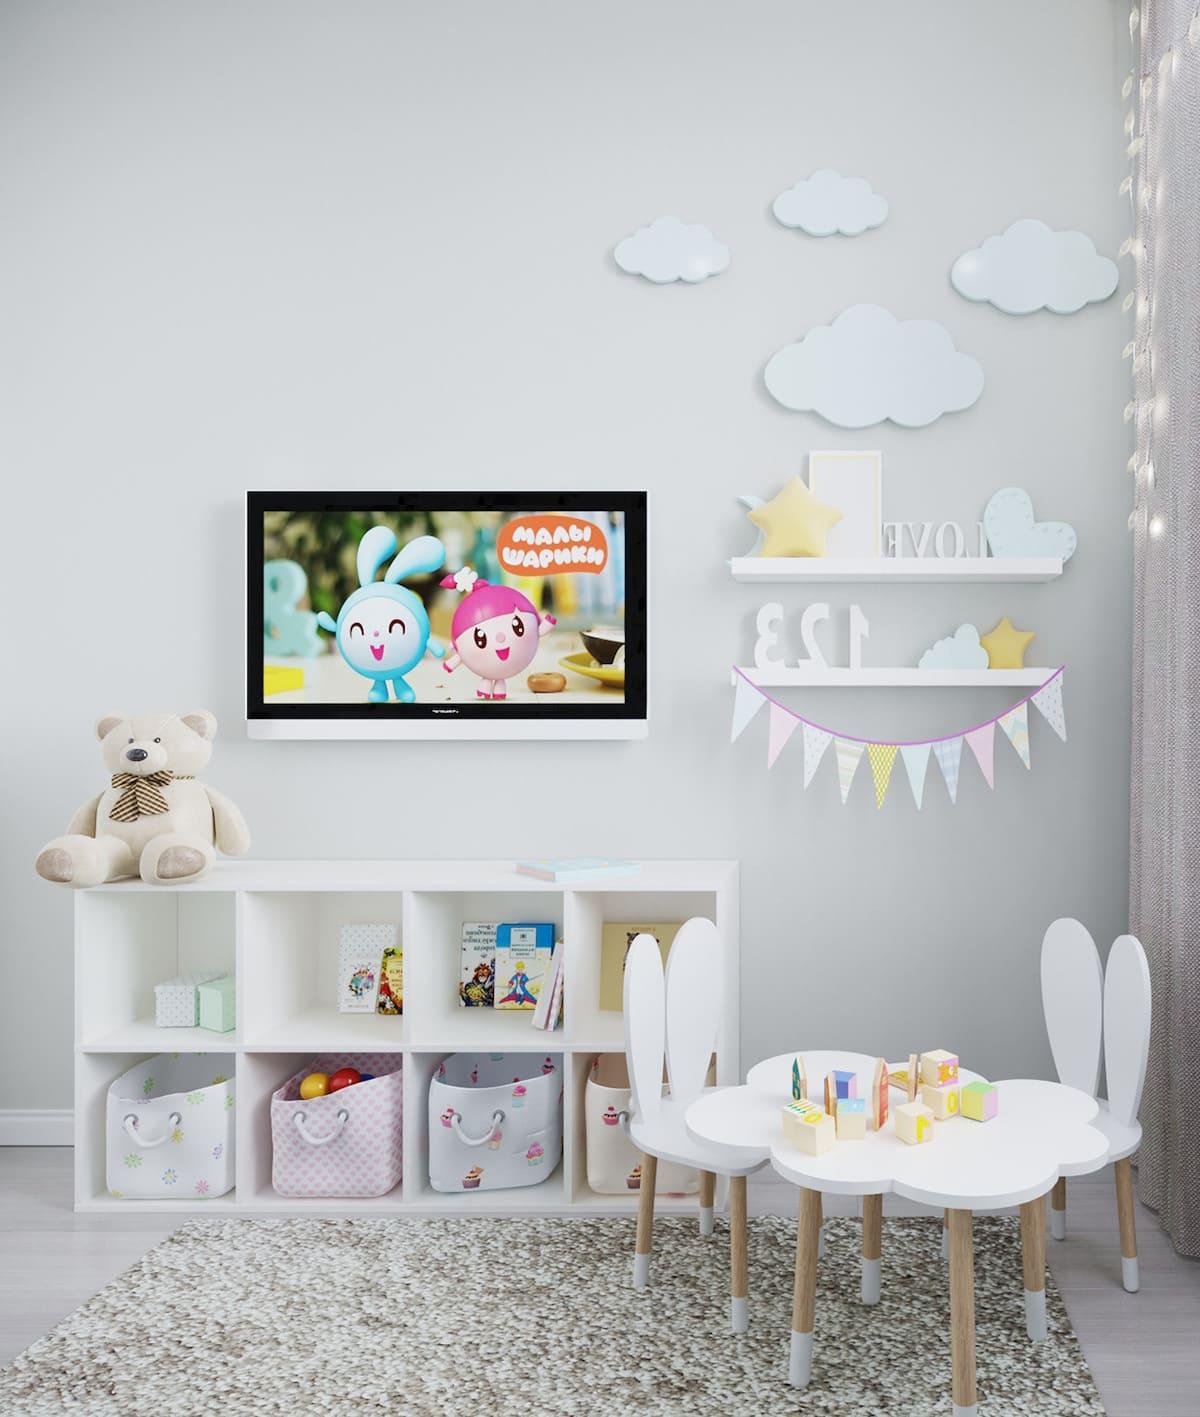 интерьер детской комнаты фото 6